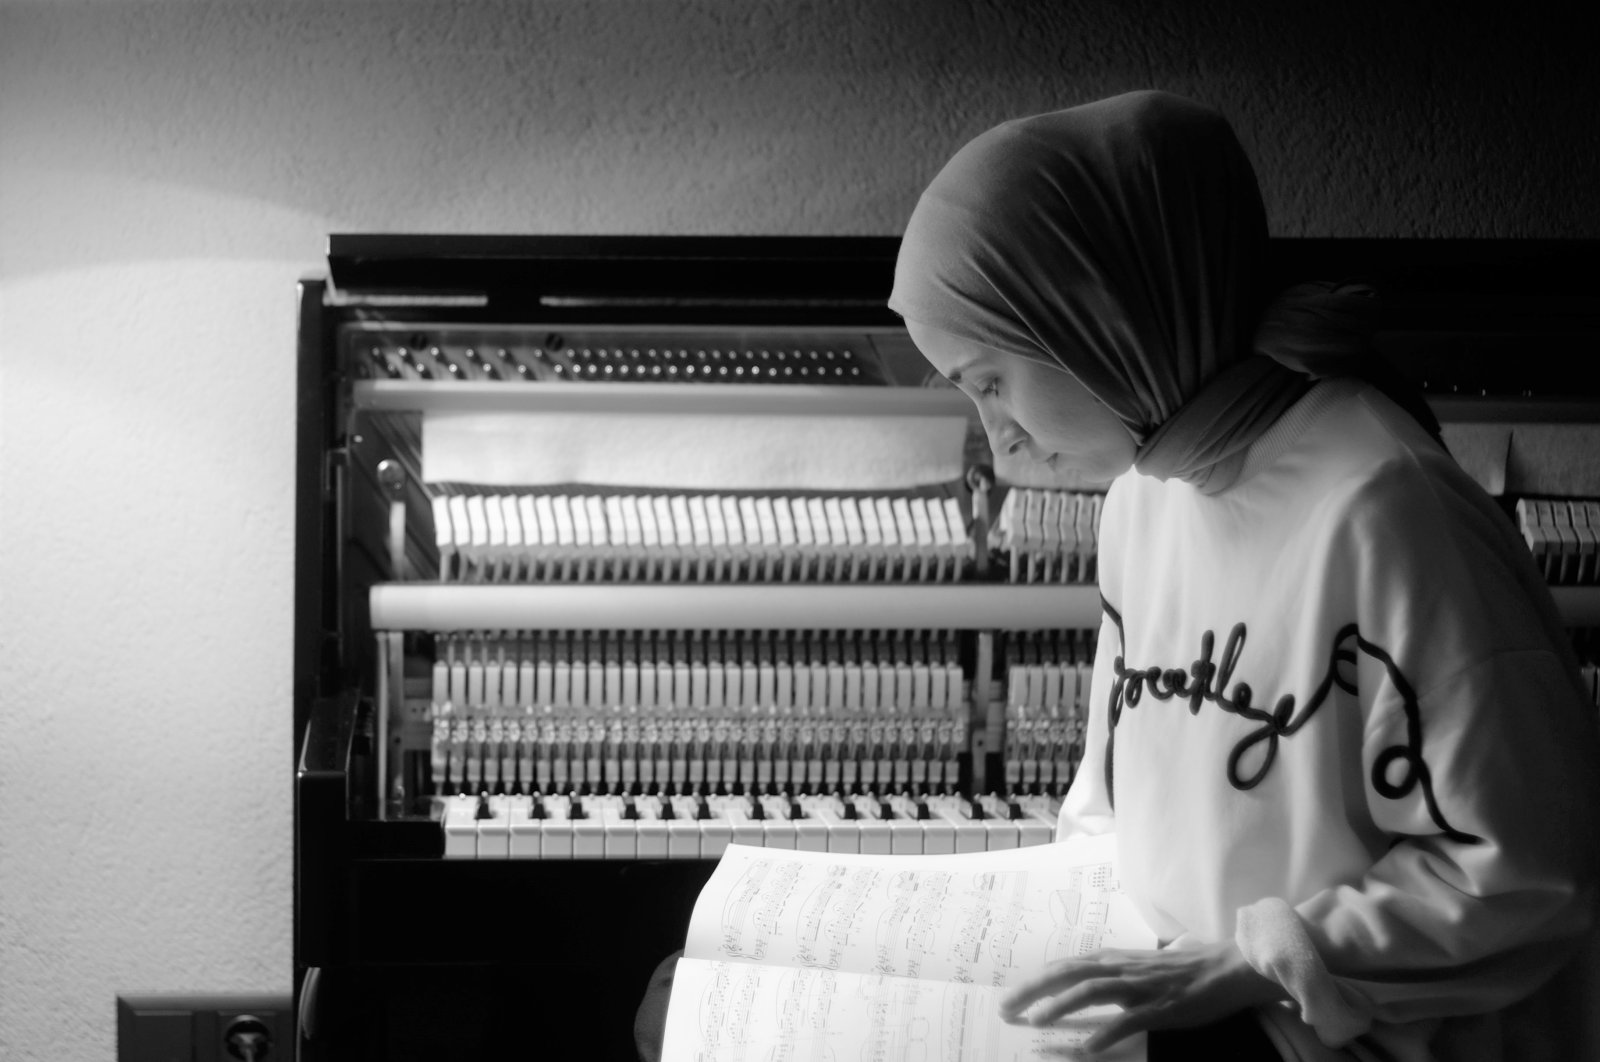 Büşra Kayıkçı poses with a music notebook in front of her piano. (Courtesy of Büşra Kayıkçı)